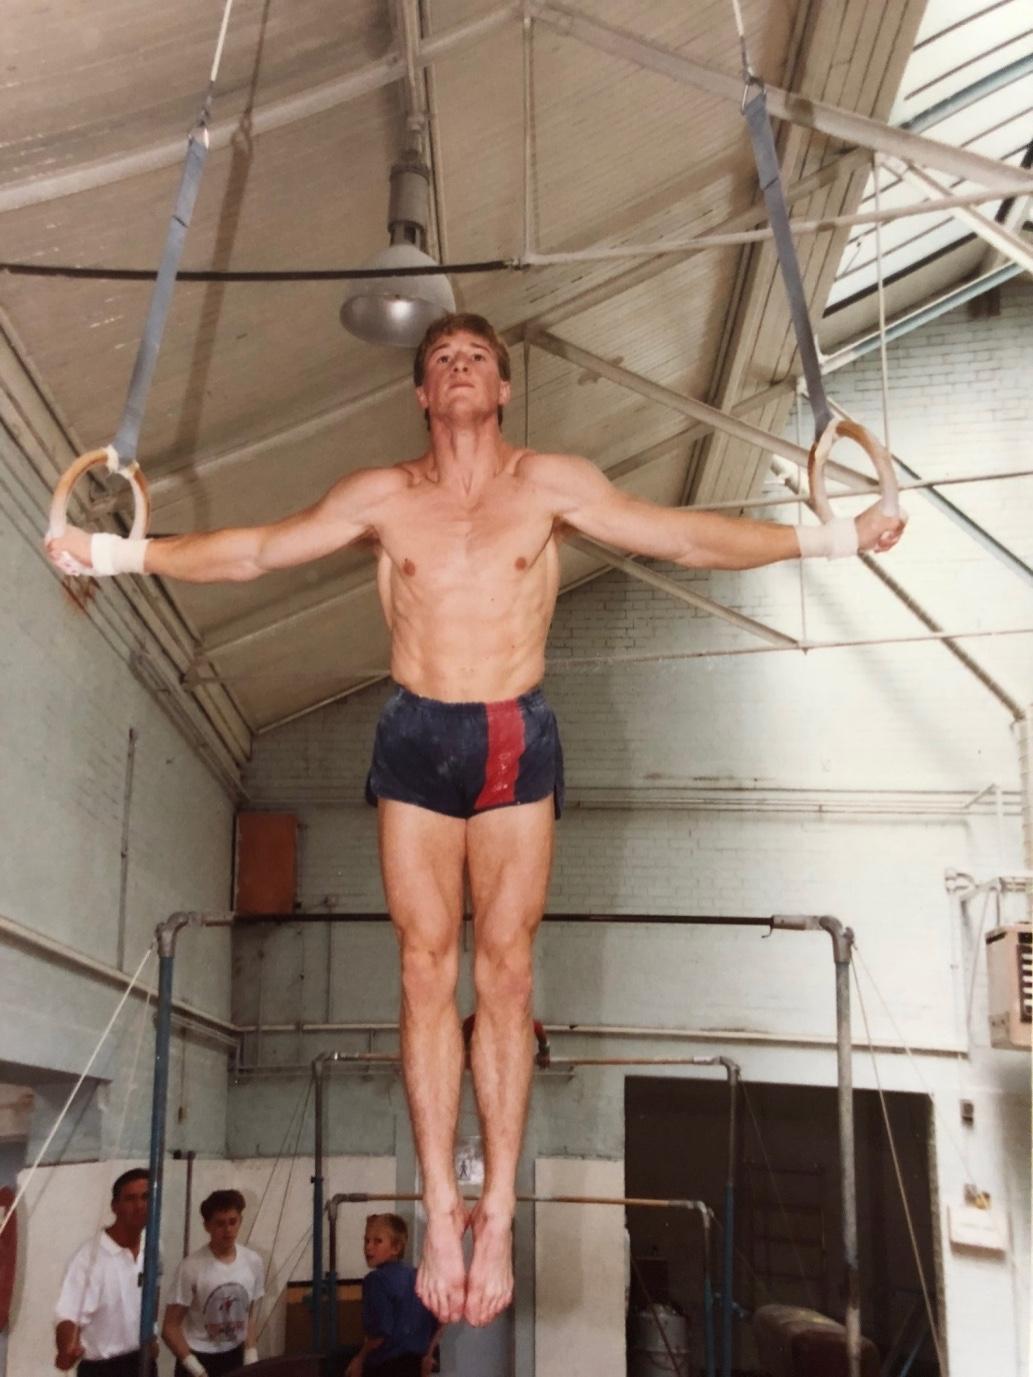 Paul Bowler training on Rings